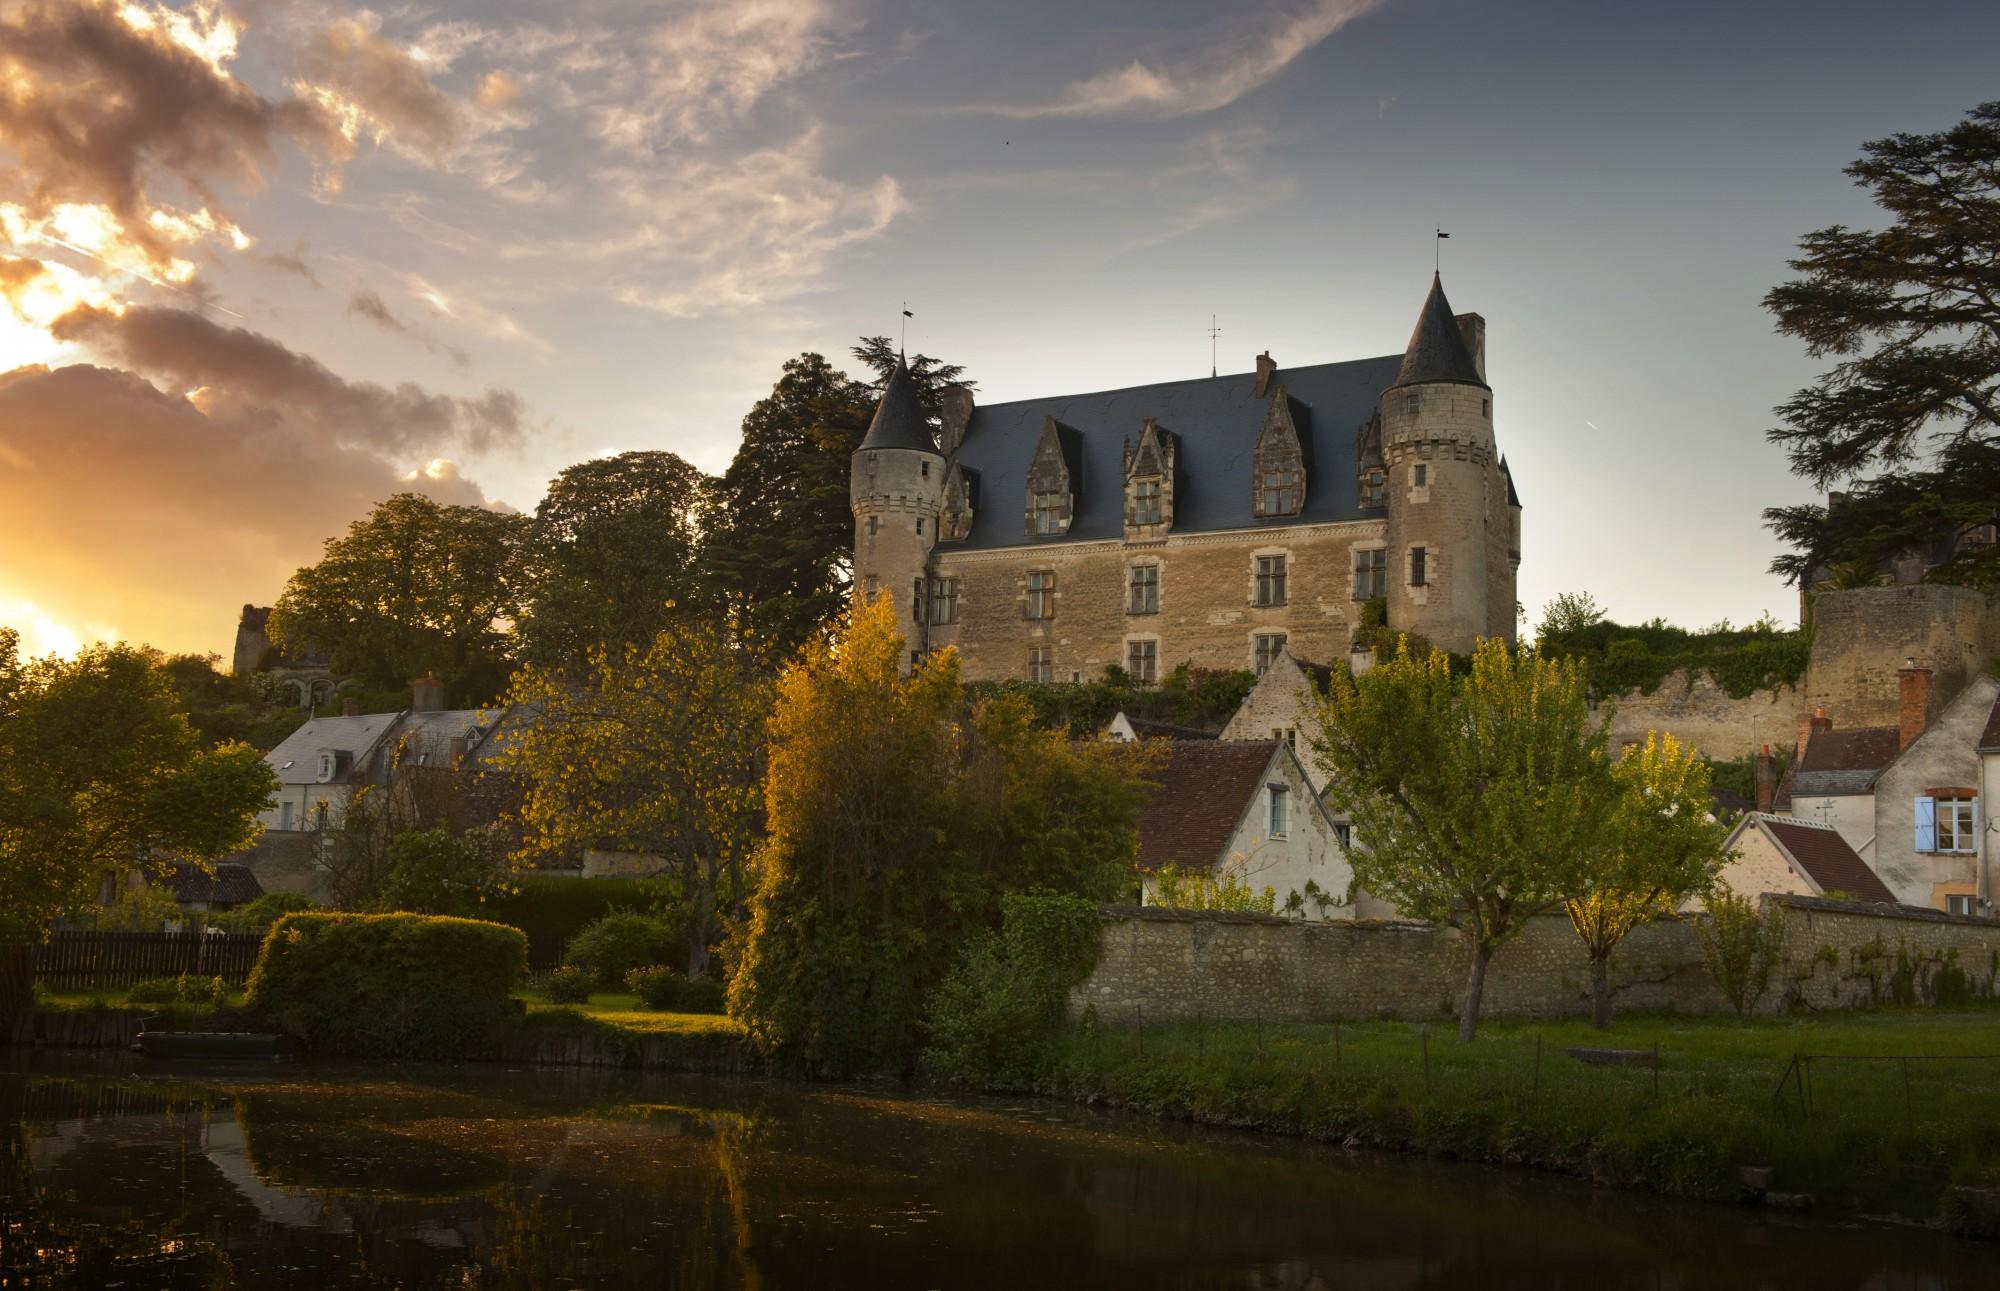 montresor-balcon-indrois-chateau-crepusculeDSC_7381 1